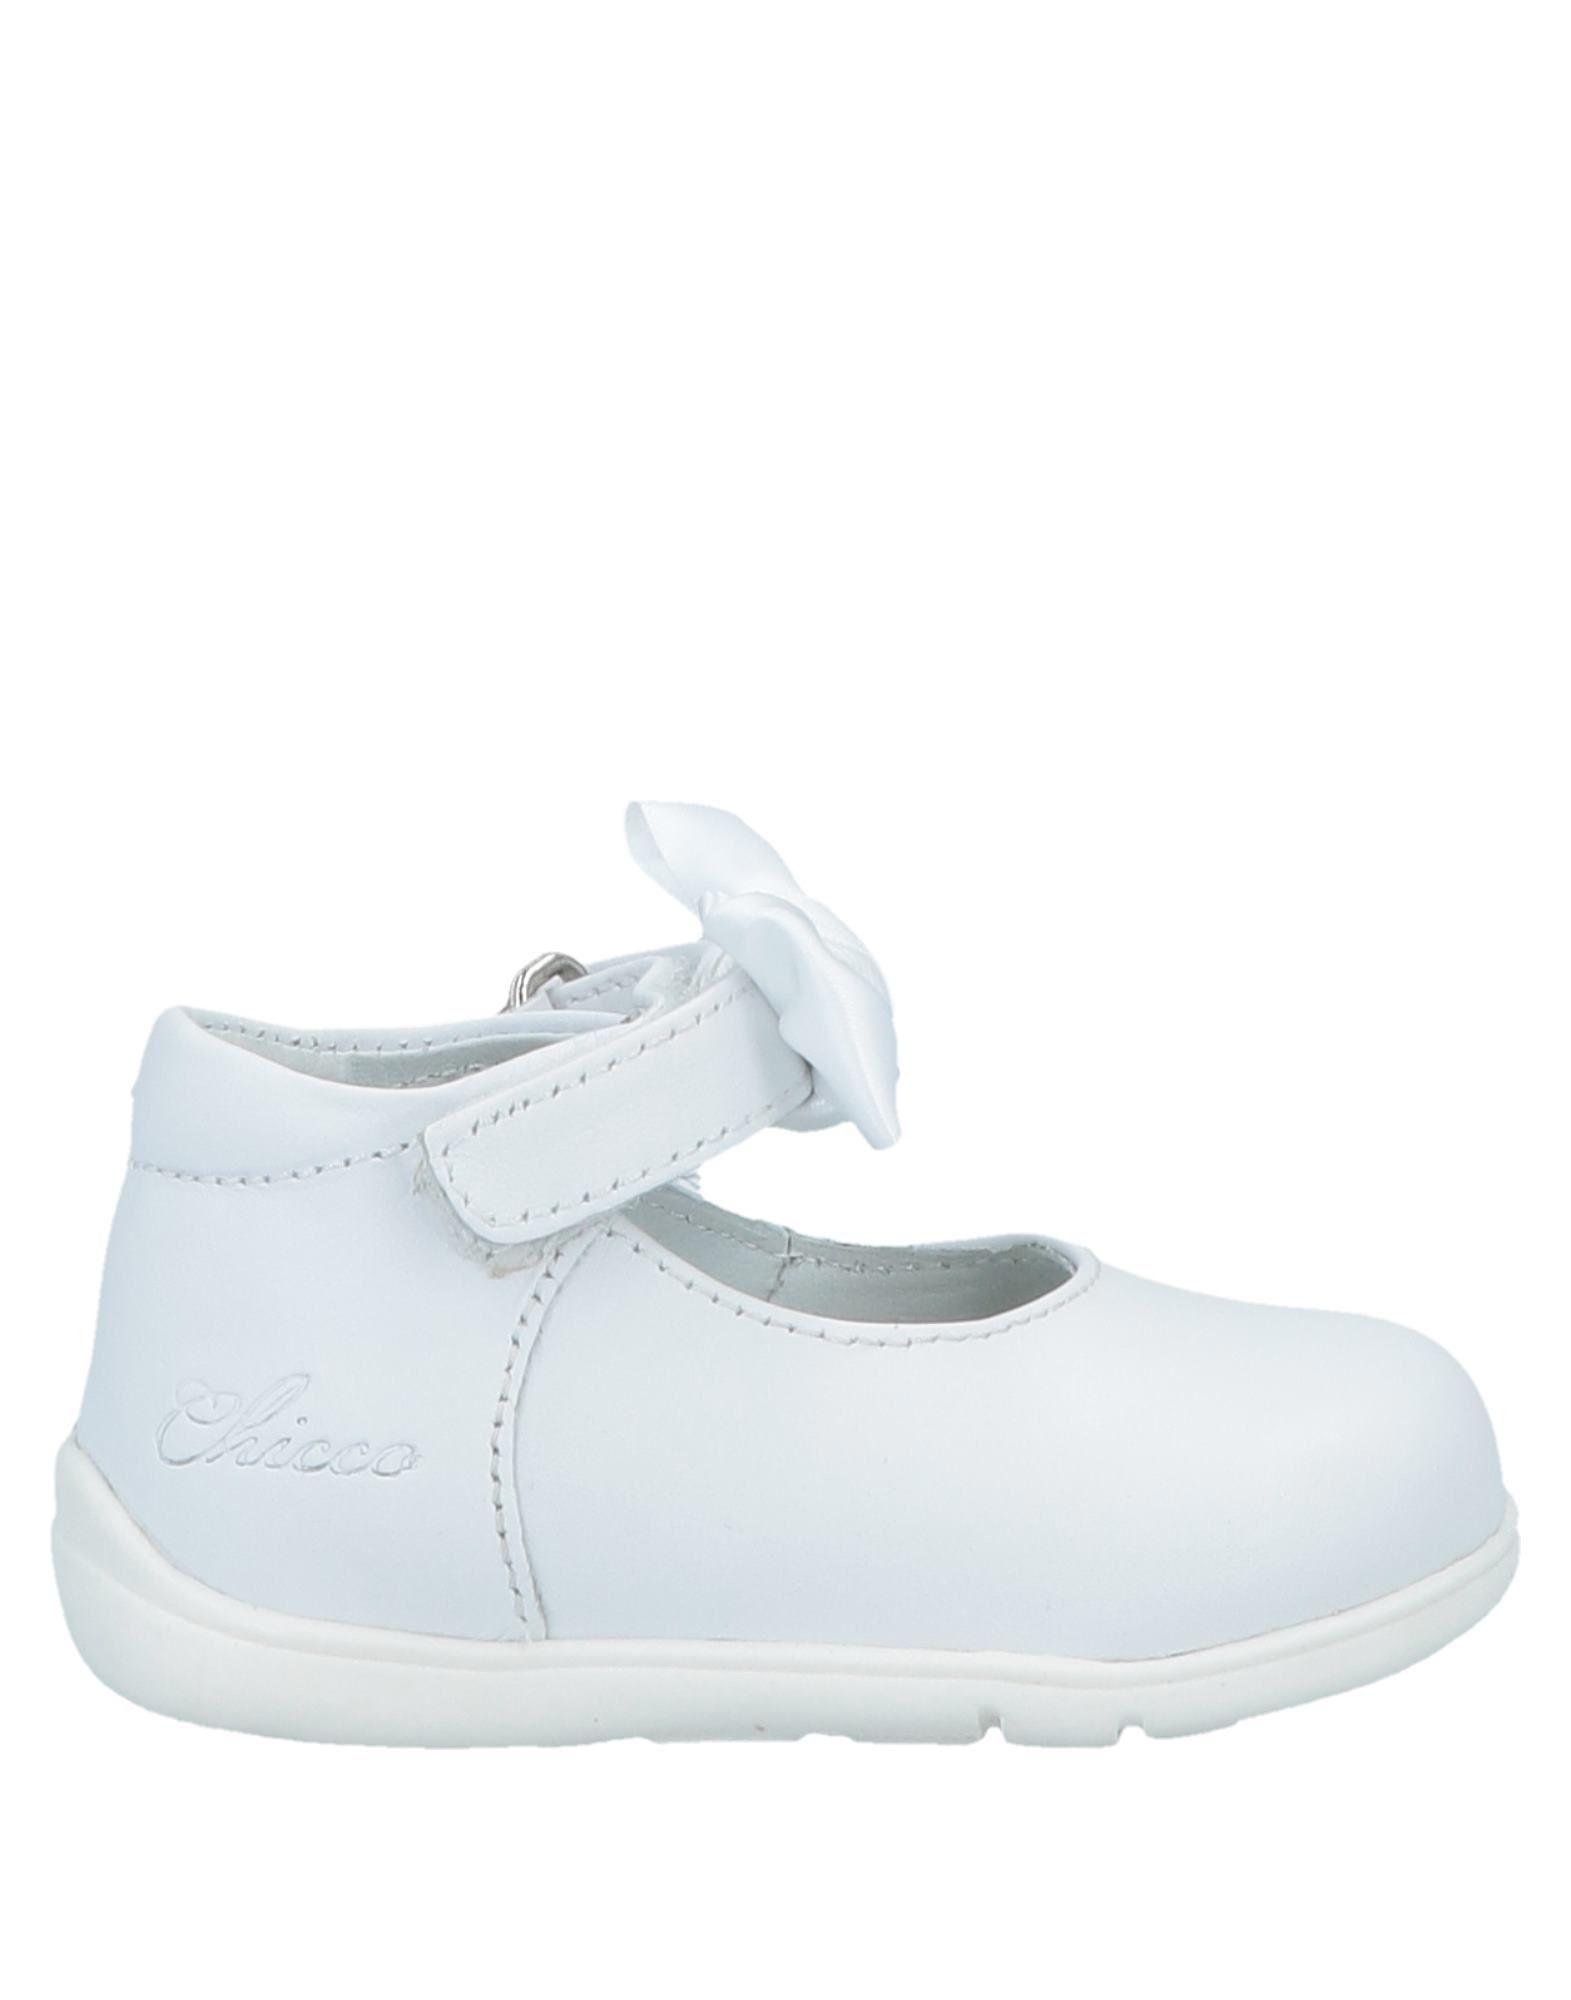 buy popular b8cdc ad70a Ballerine Chicco Bambina 0-24 mesi - Acquista online su YOOX